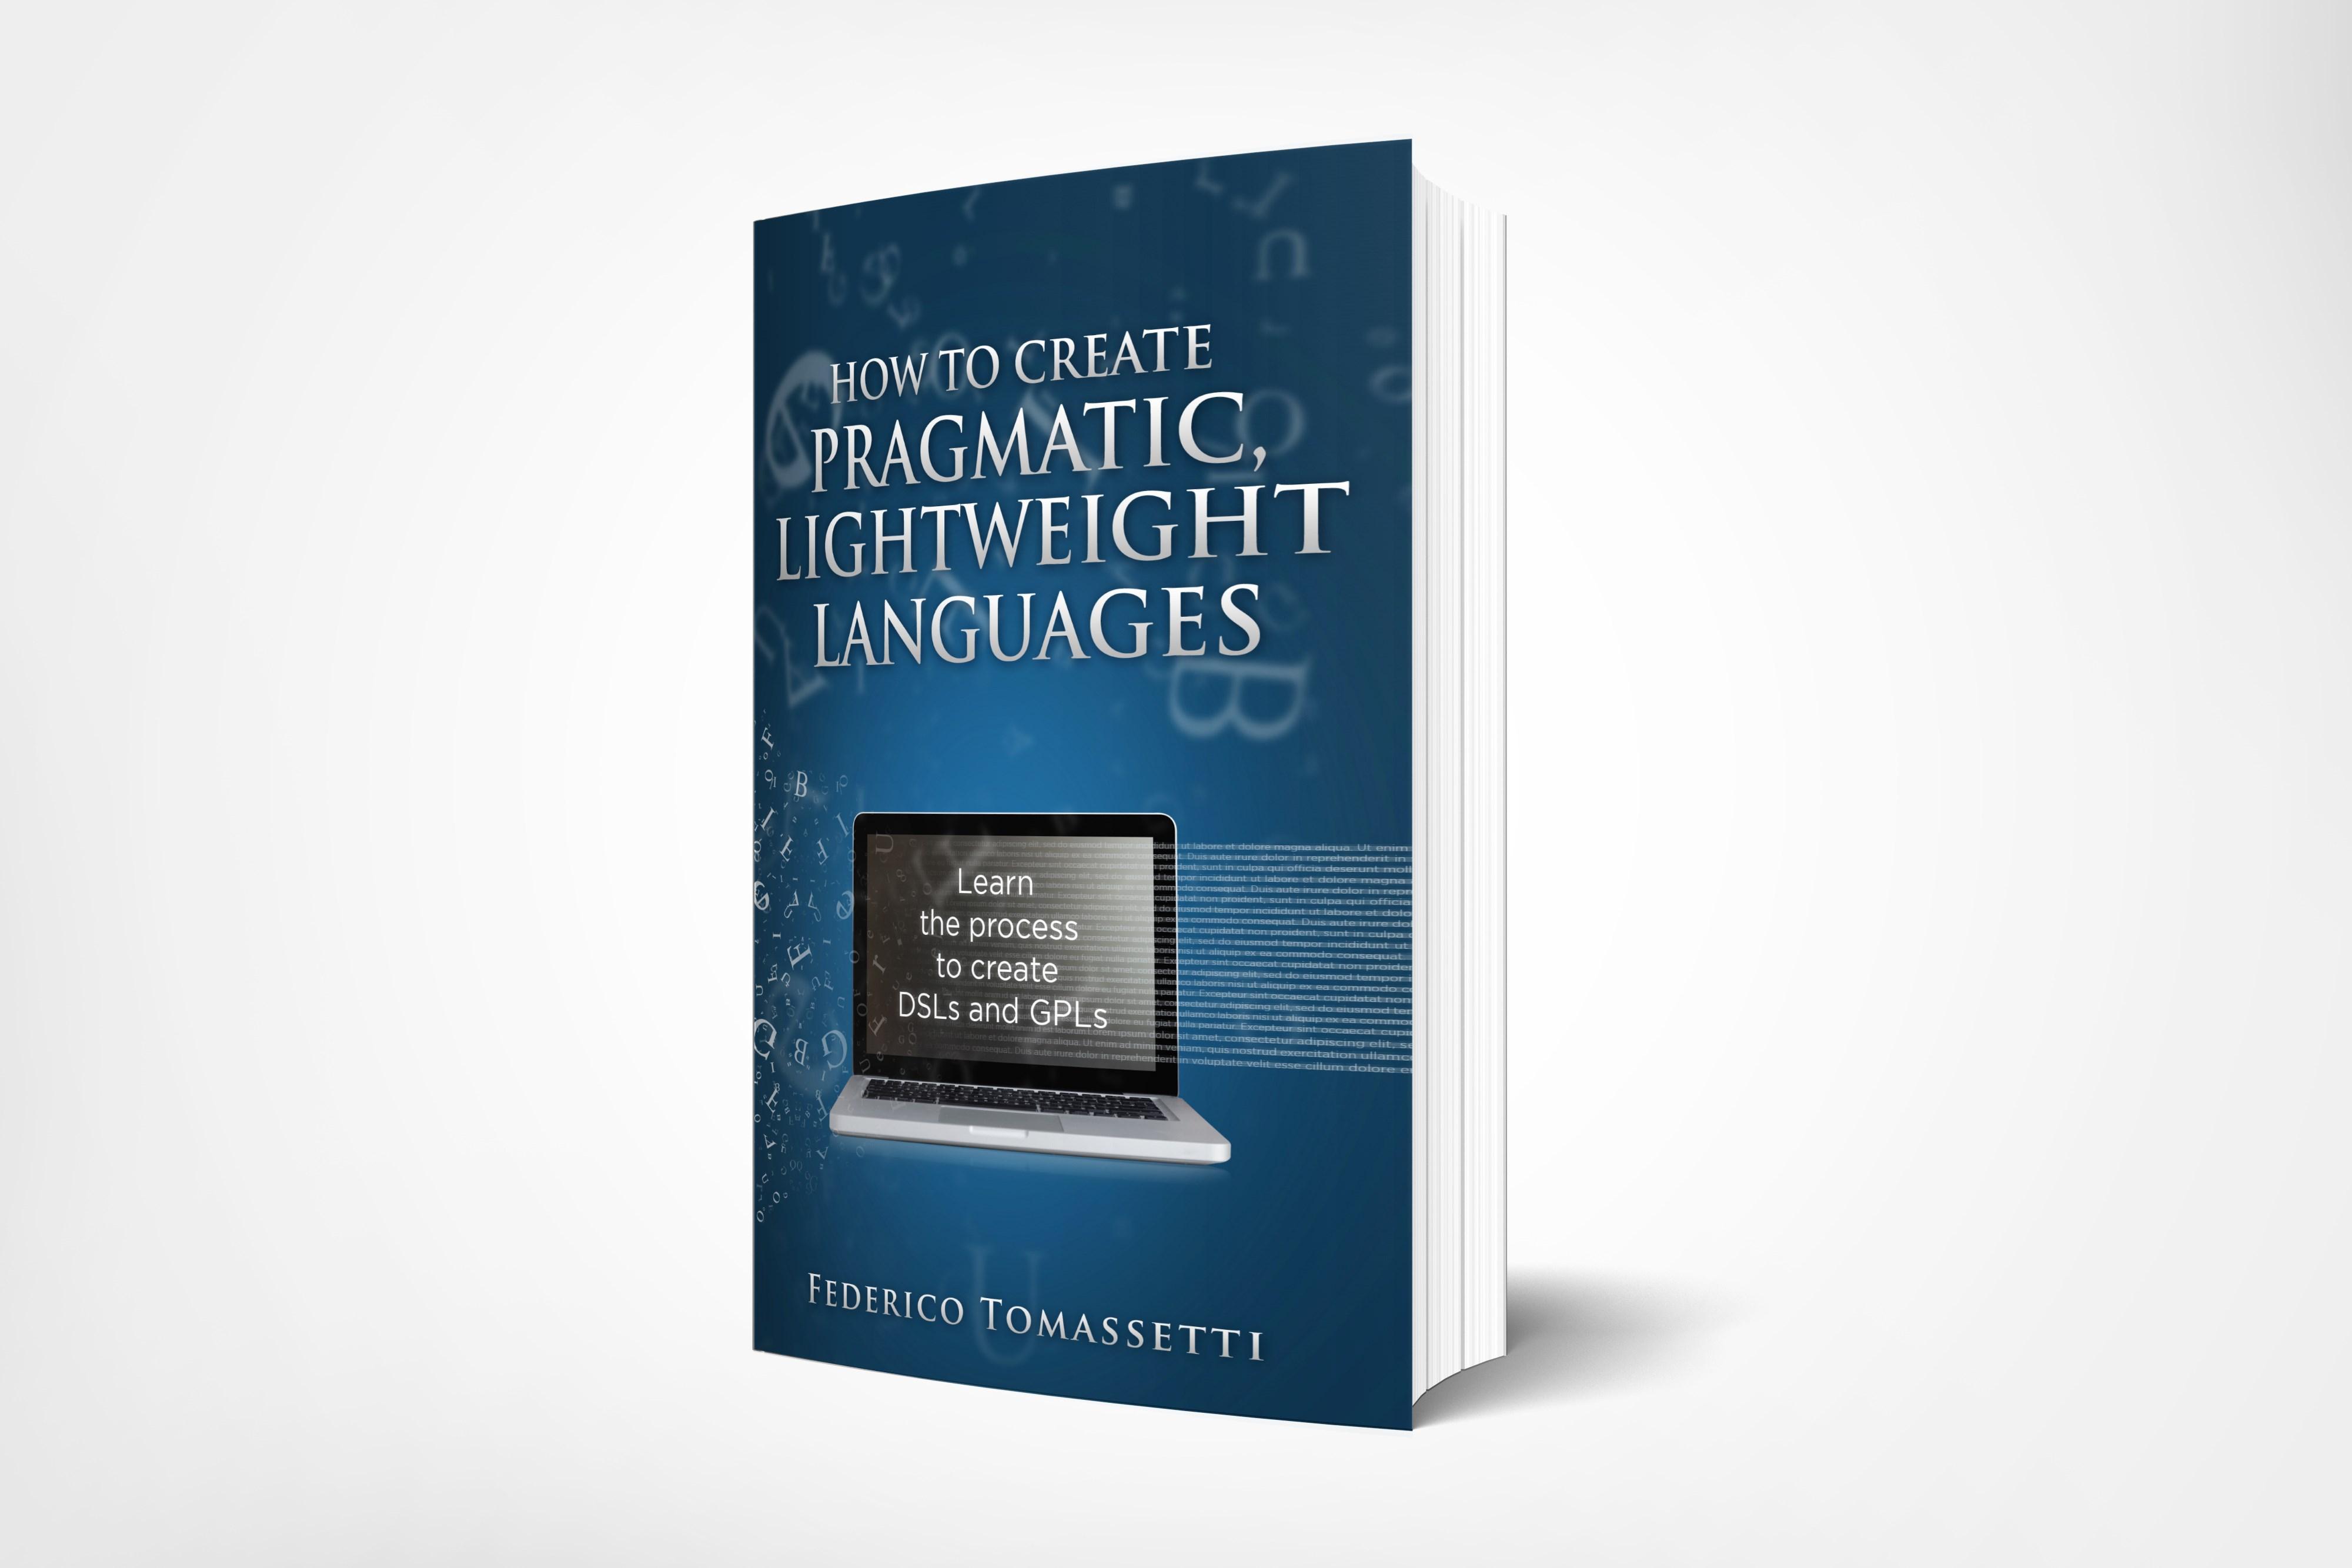 How to Create Pragmatic, Lightweight Languages - Federico Tomassetti